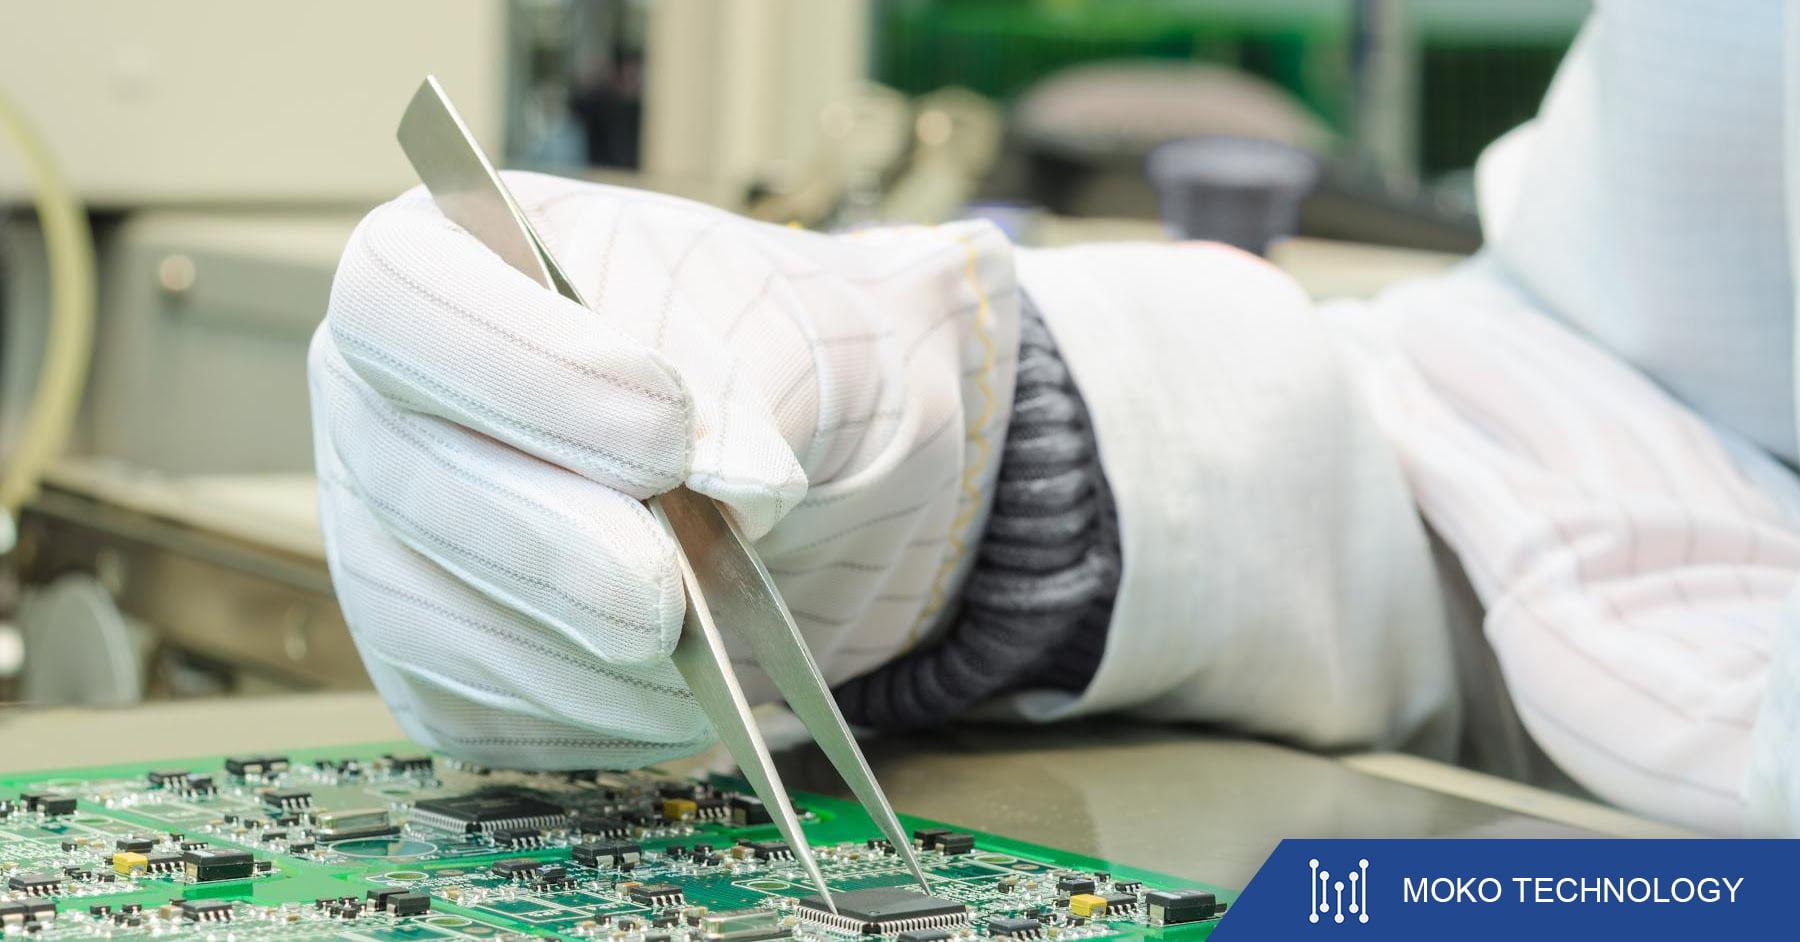 MOKO Technology PCB Testing